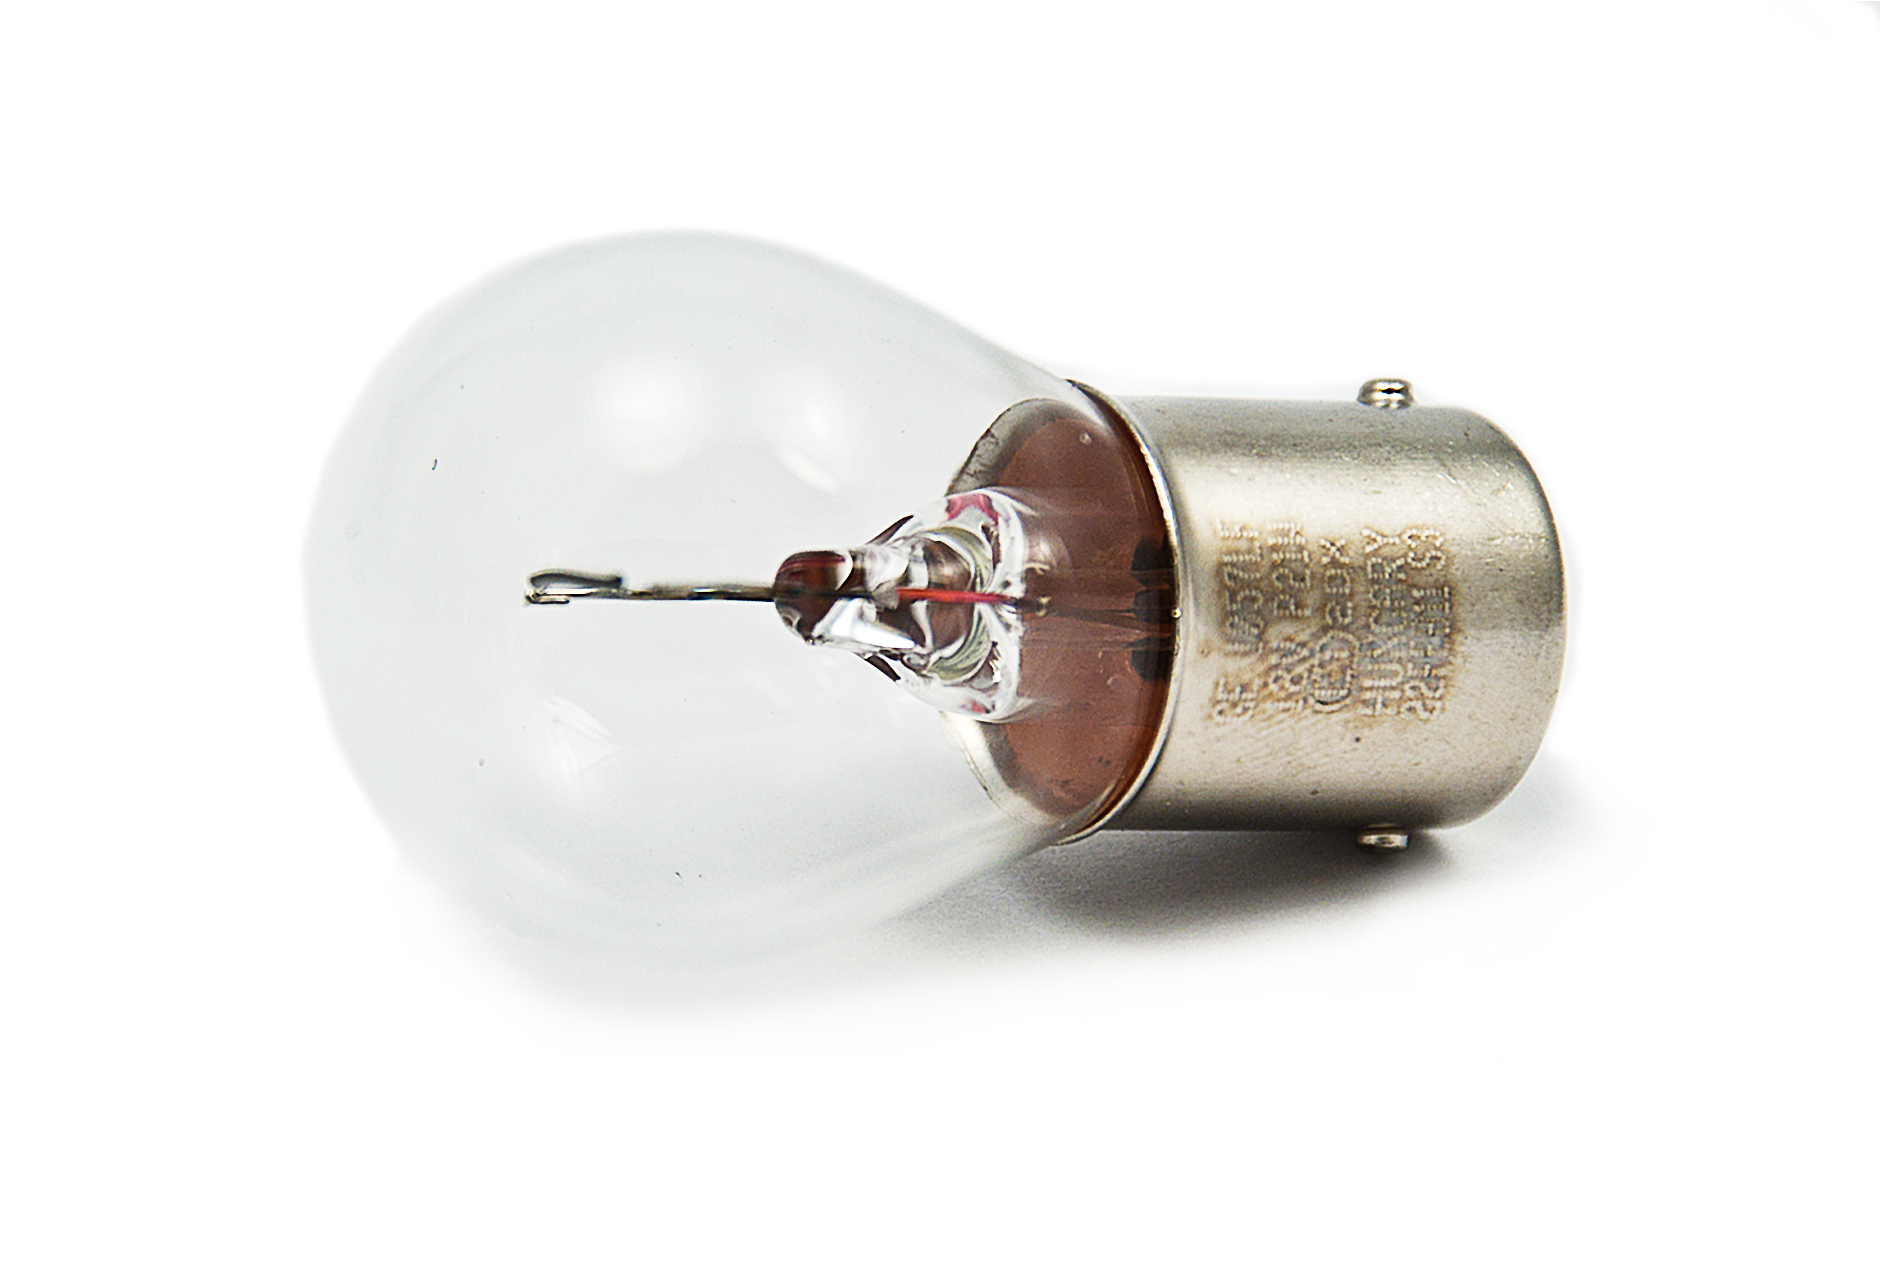 Bmw P12v 21w Bulb E36 E38 E39 E46 E53 E90 E91 Z3 63217160789 Ebay